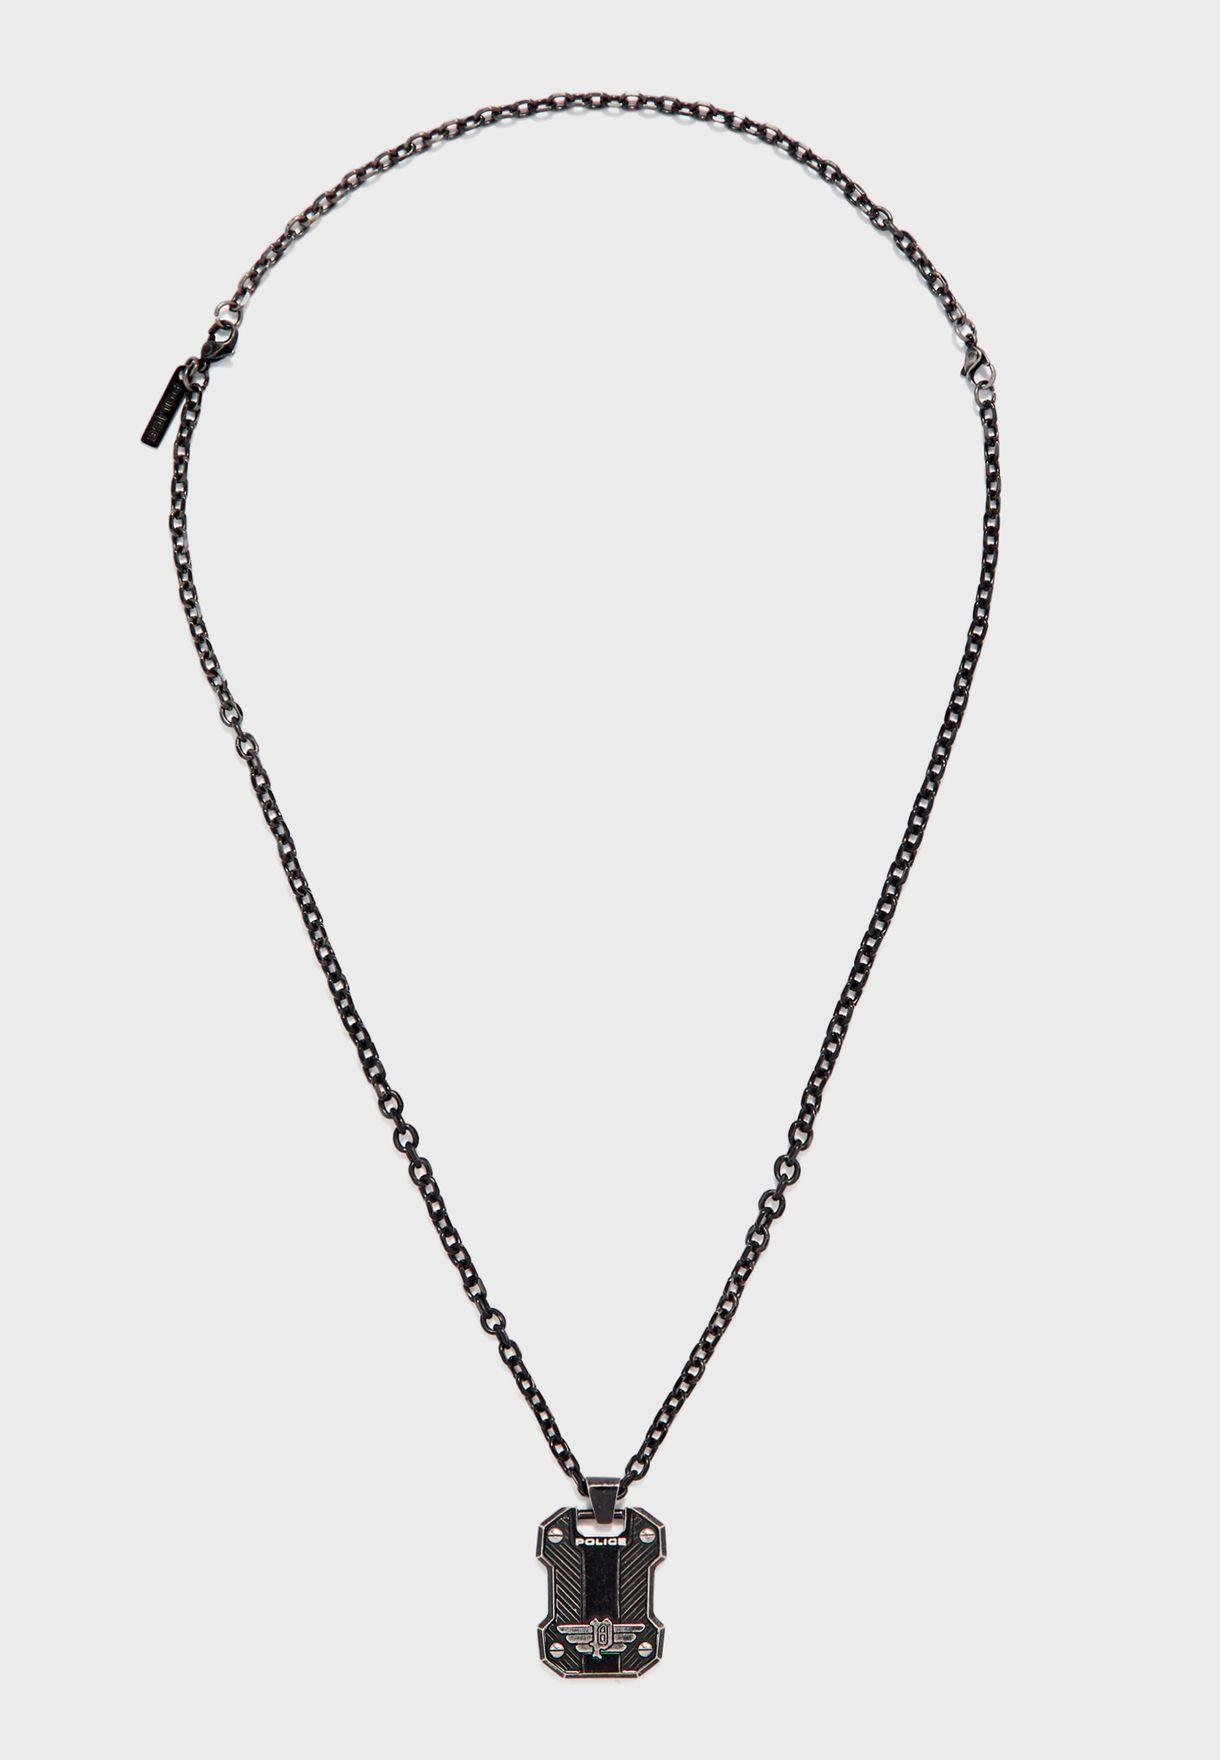 P PJ 26324PSEB/02 Bruckner Necklace